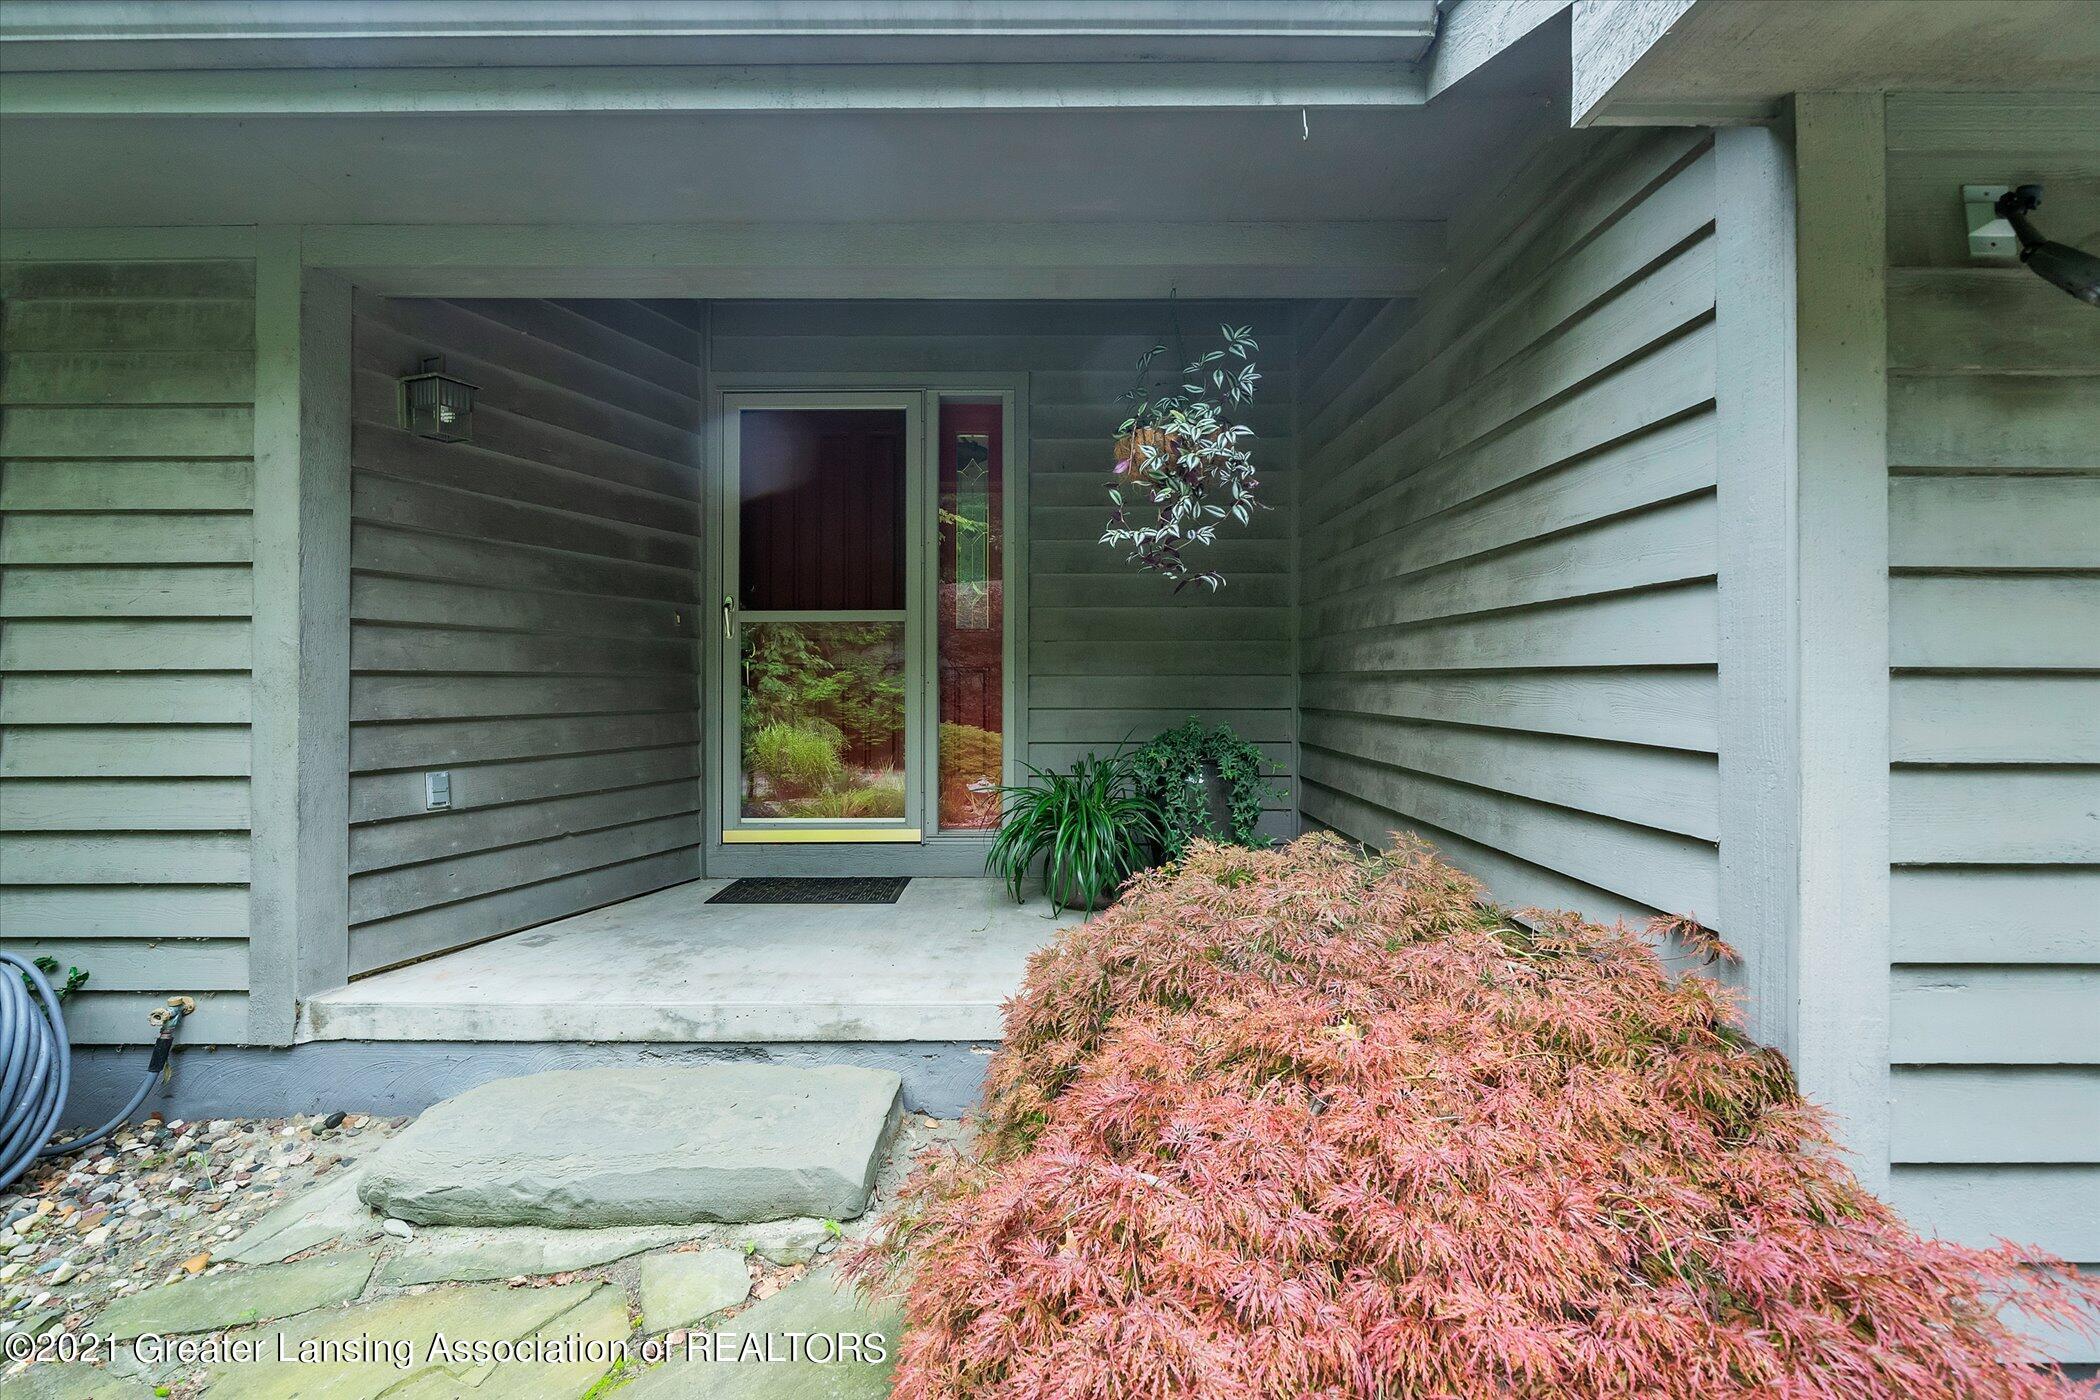 442 Shoesmith Rd - (7) EXTERIOR Front Porch - 8